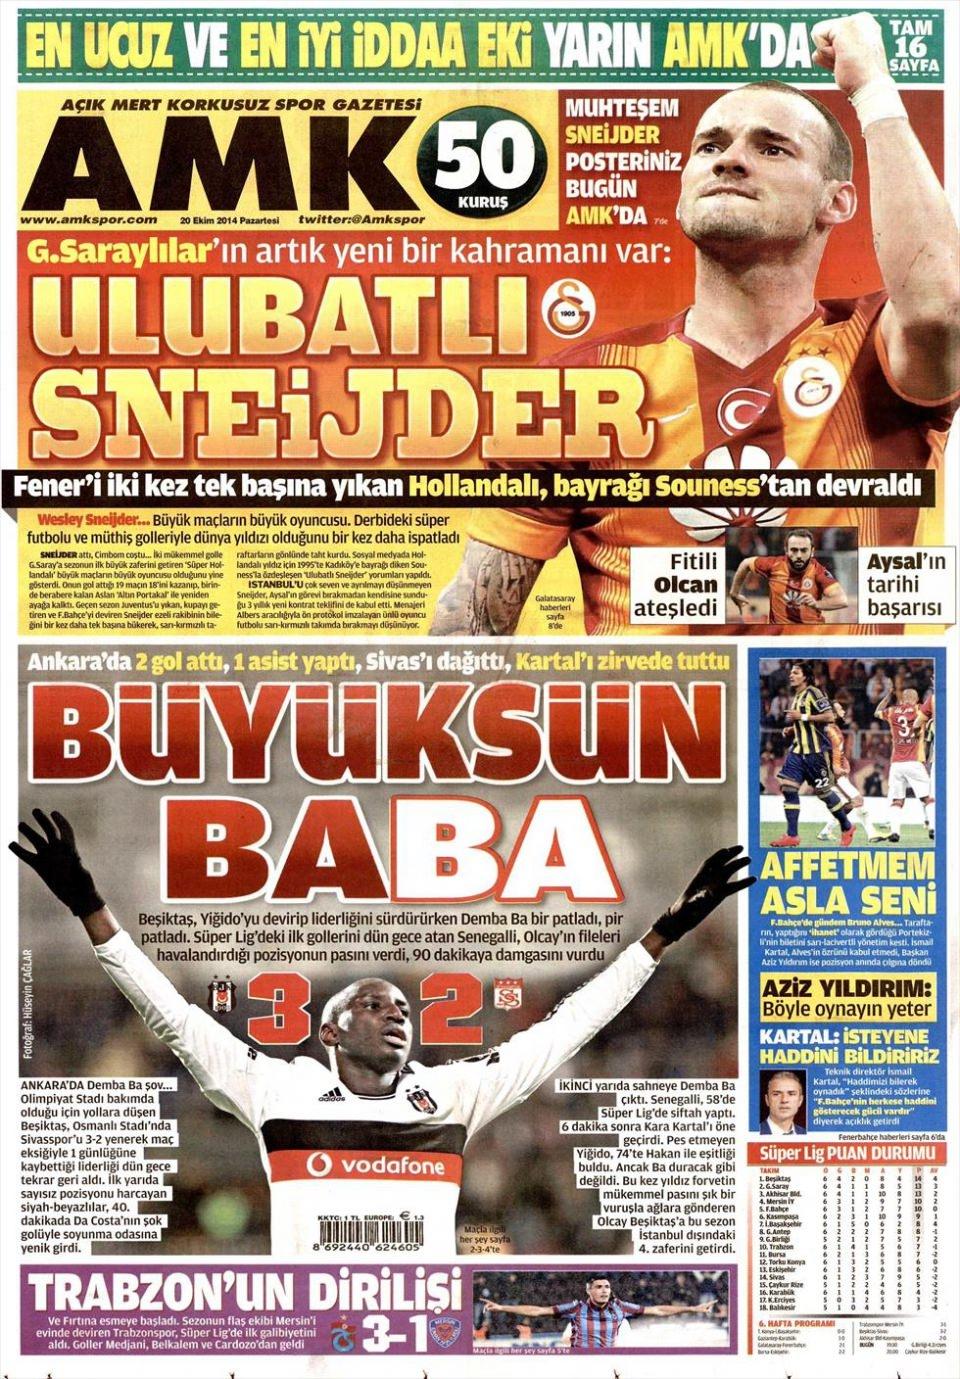 20 Ekim 2014 gazete manşetleri 2